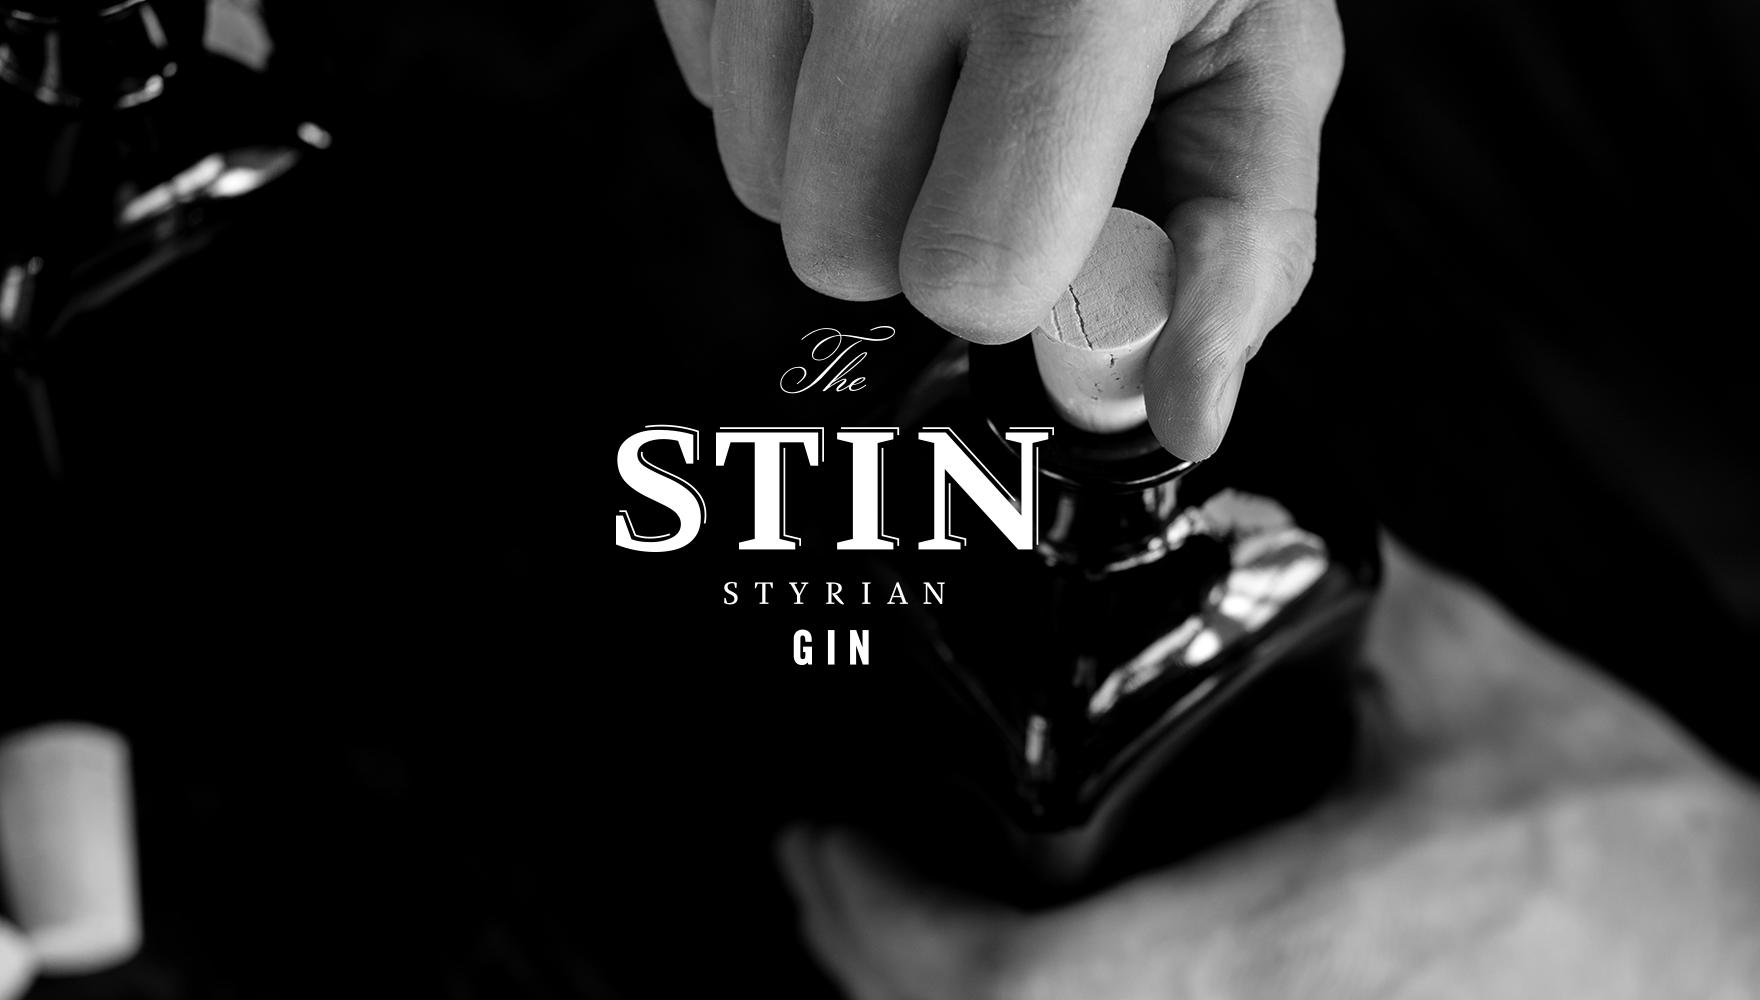 The STIN – Styrian Gin